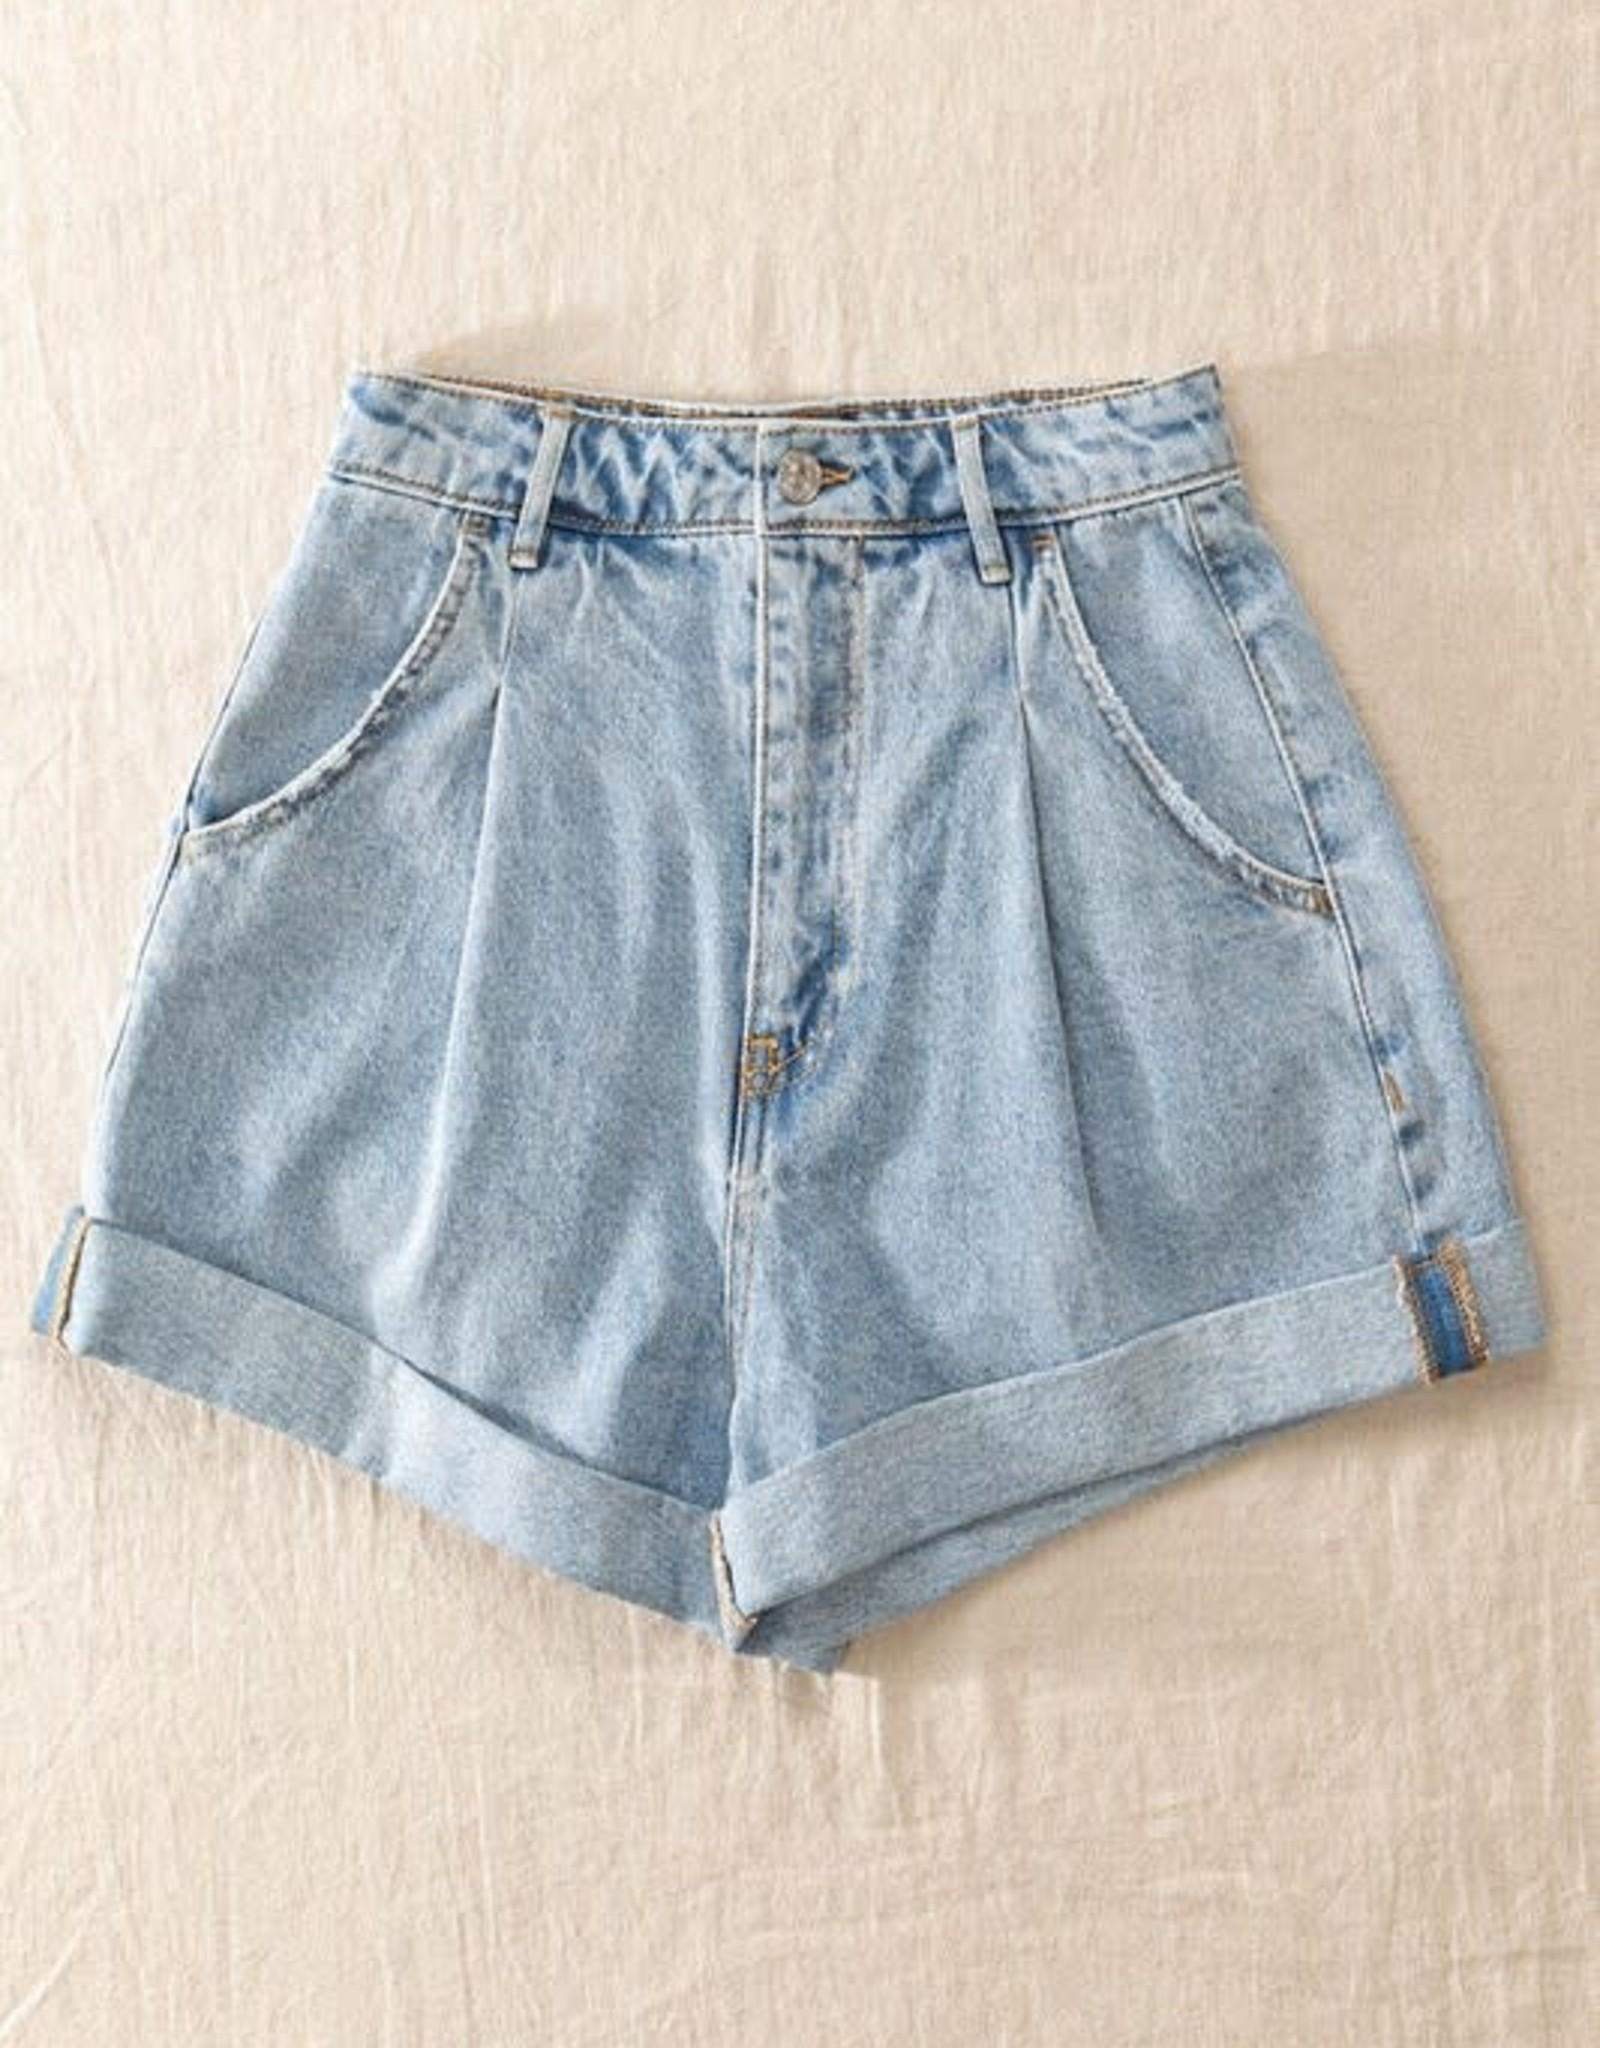 Miss Bliss Denim High Waist Folded Shorts- Light Blue